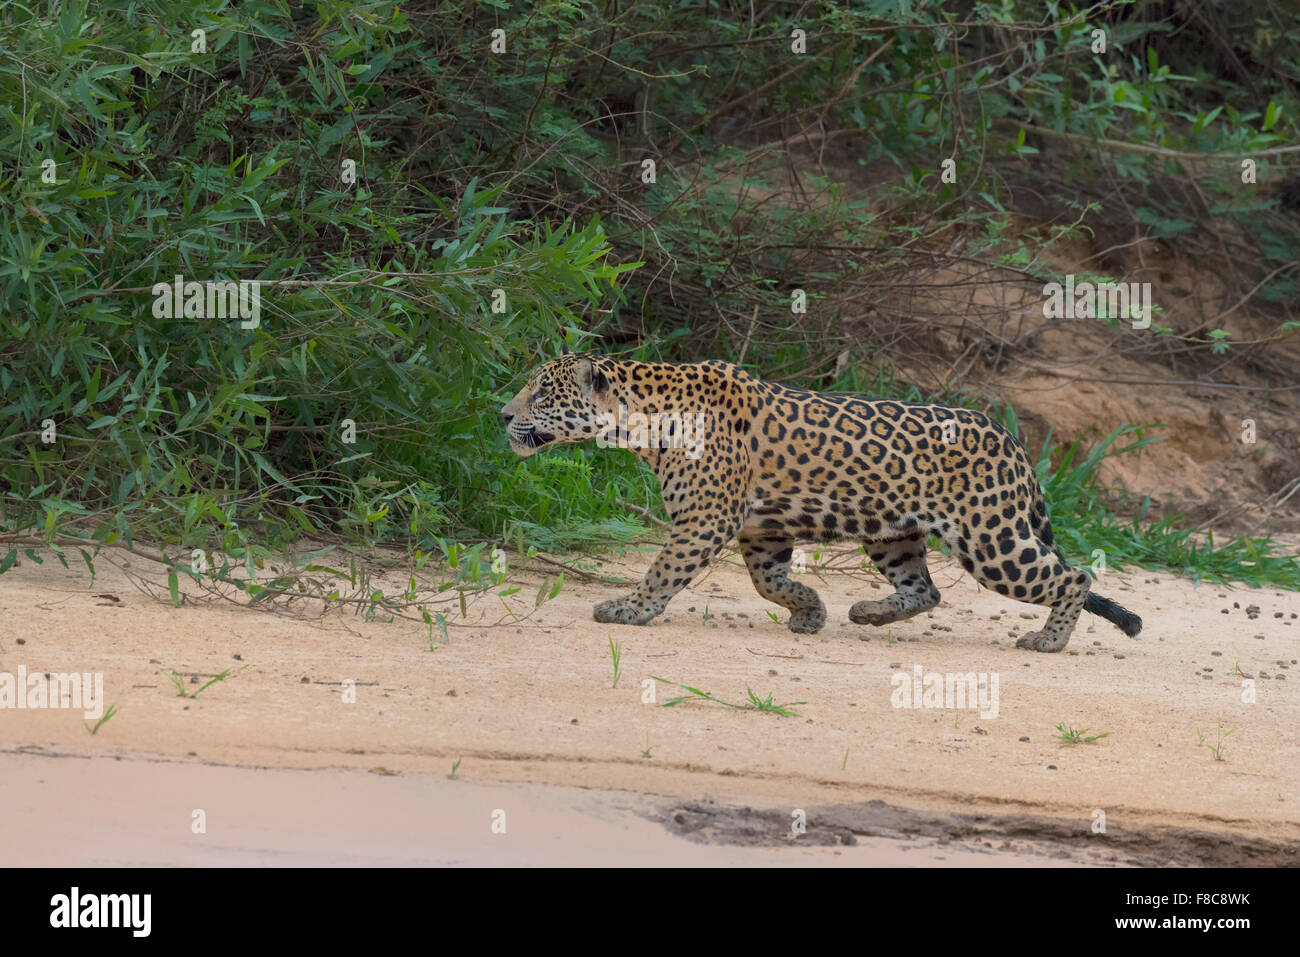 Jaguar (Panthera onca), Cuiaba river, Pantanal, Mato Grosso, Brasile Immagini Stock